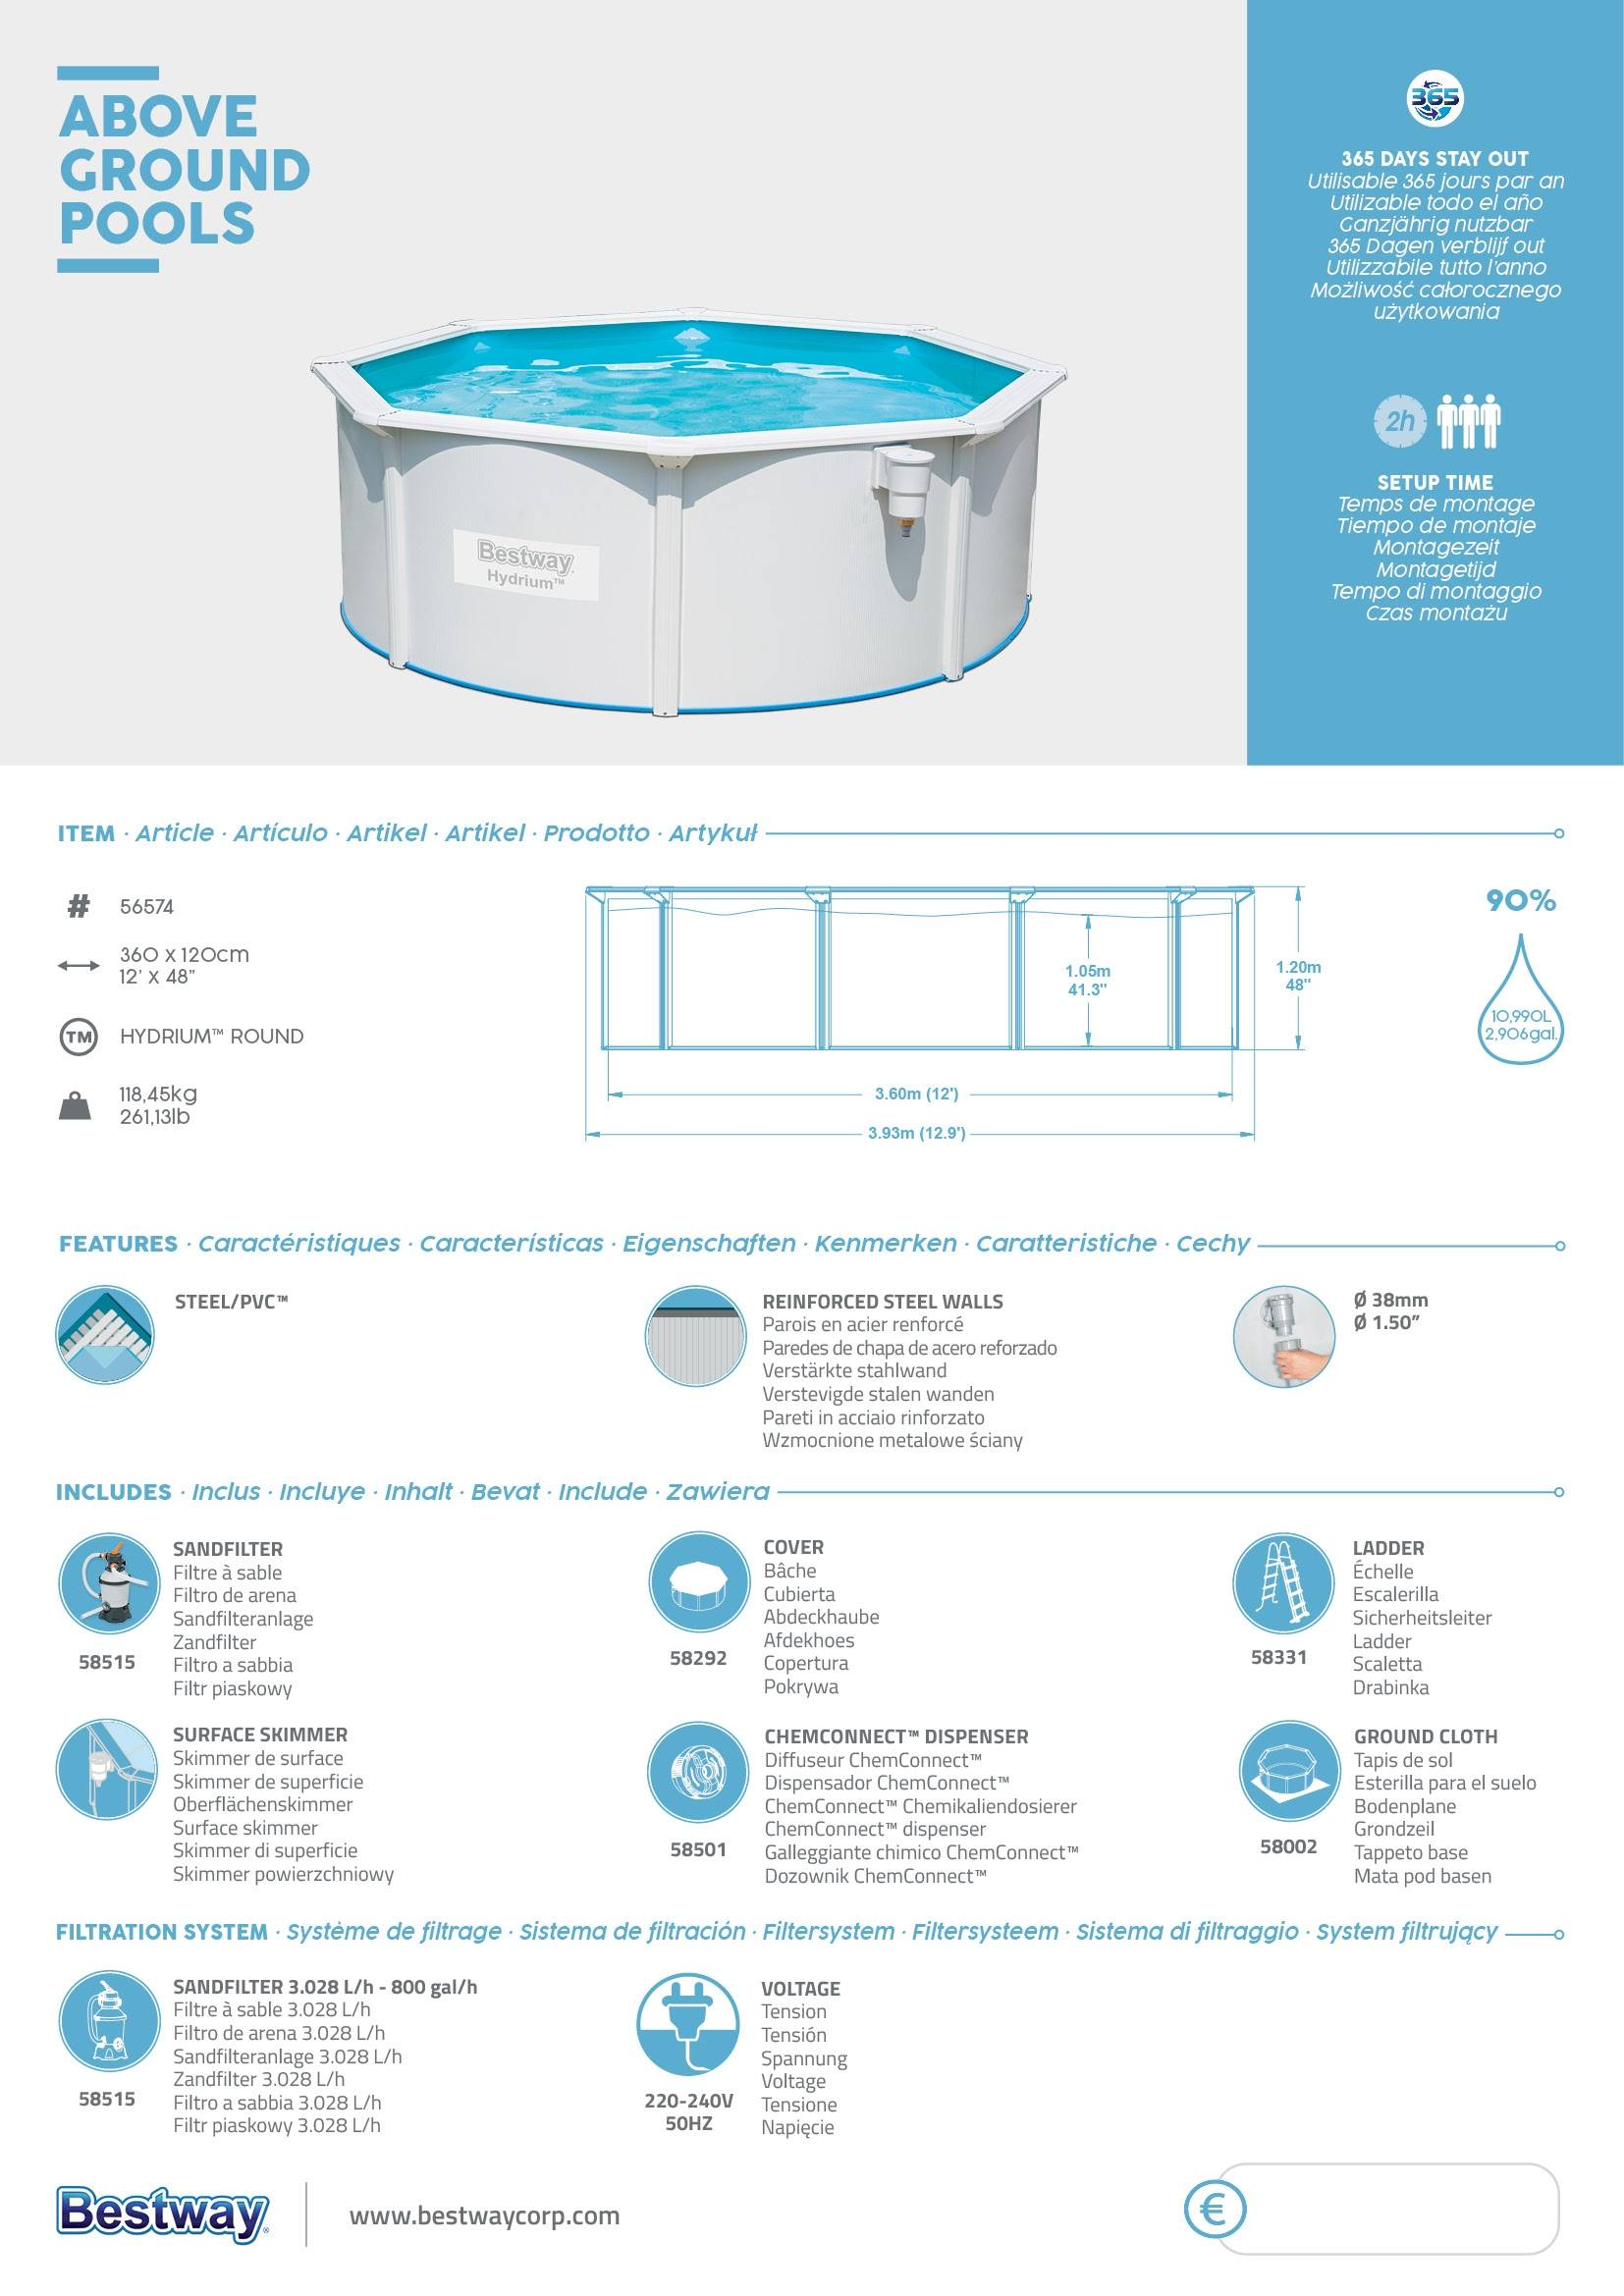 piscina de superficie bestway hydrium redonda 360x120cm